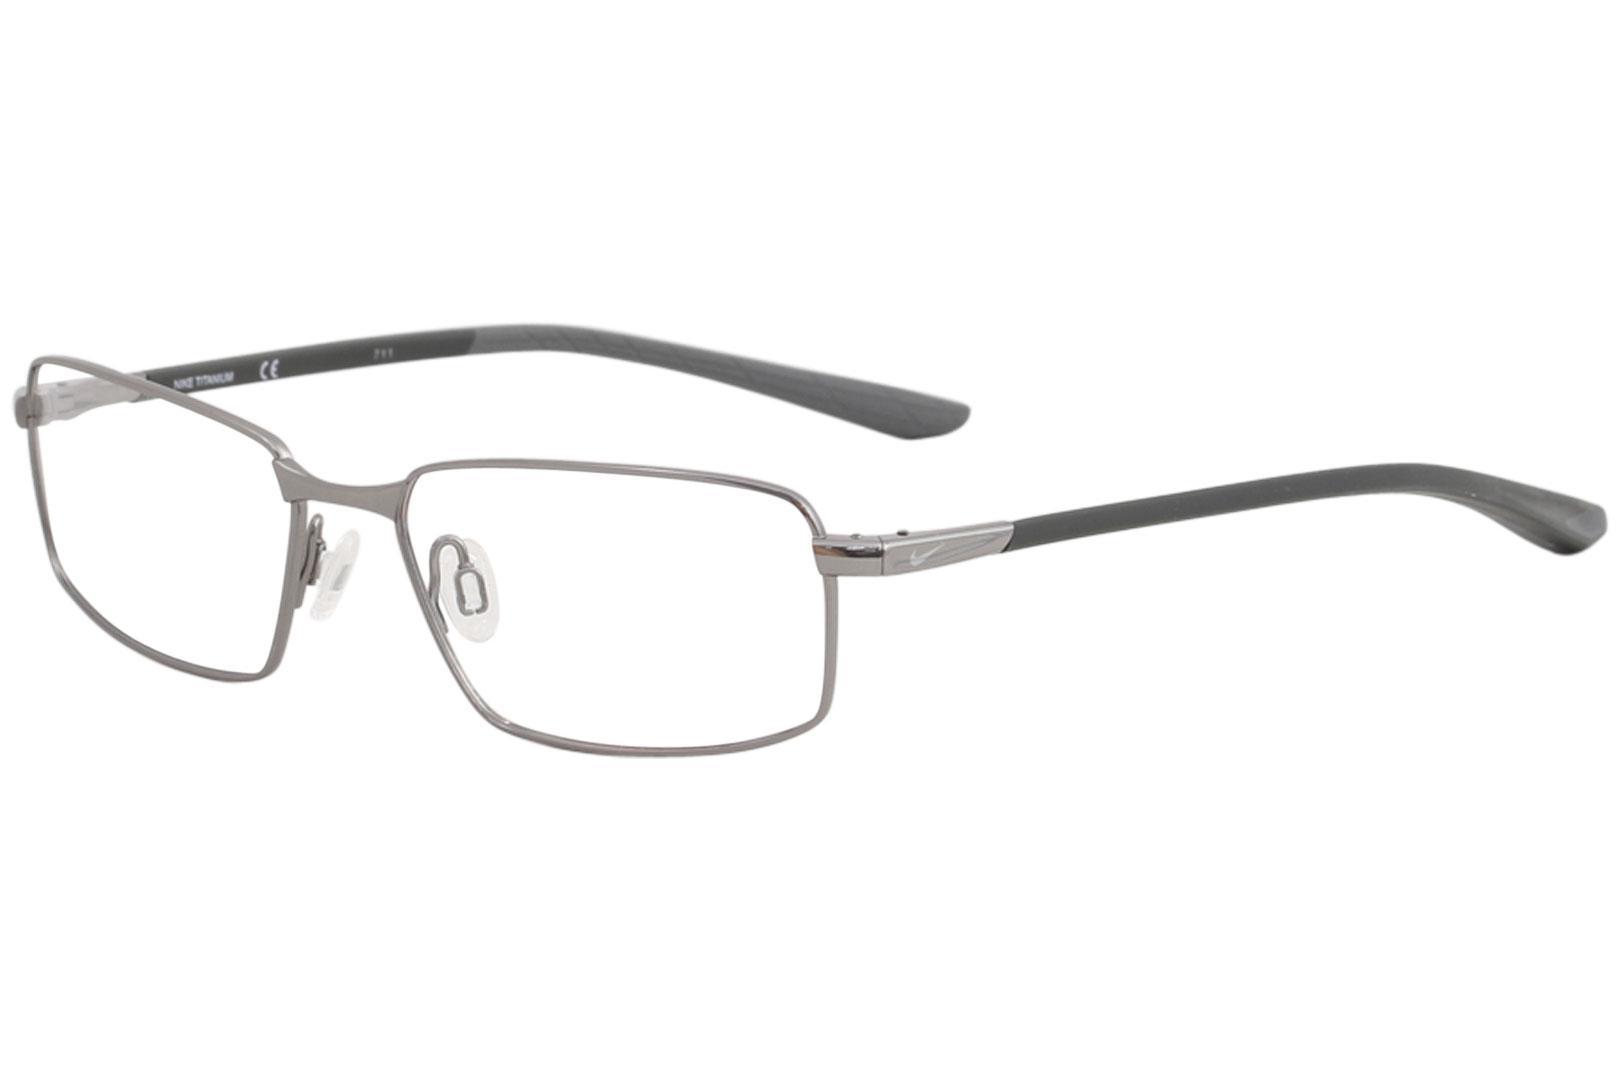 65f9a2e8bb6 Nike Men s Eyeglasses 6072 Full Rim Titanium Optical Frame